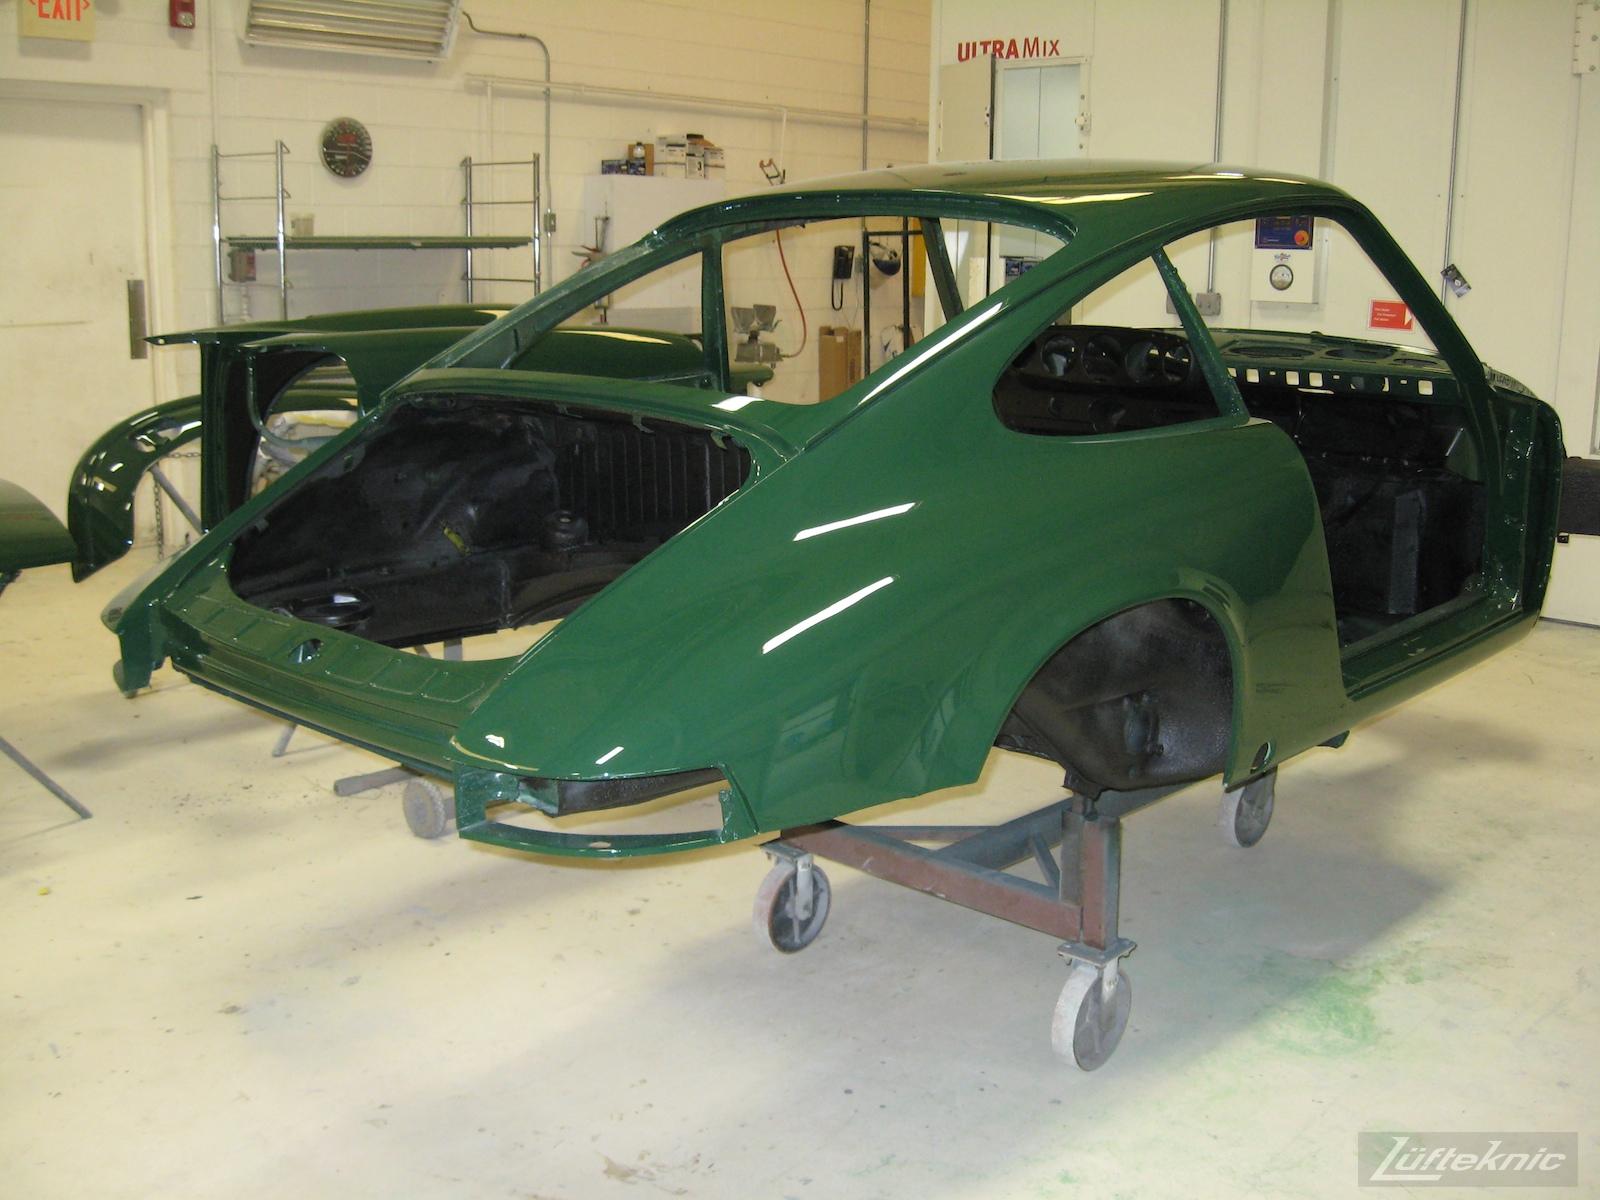 Freshly painted body shell of an Irish Green Porsche 912 undergoing restoration at Lufteknic.